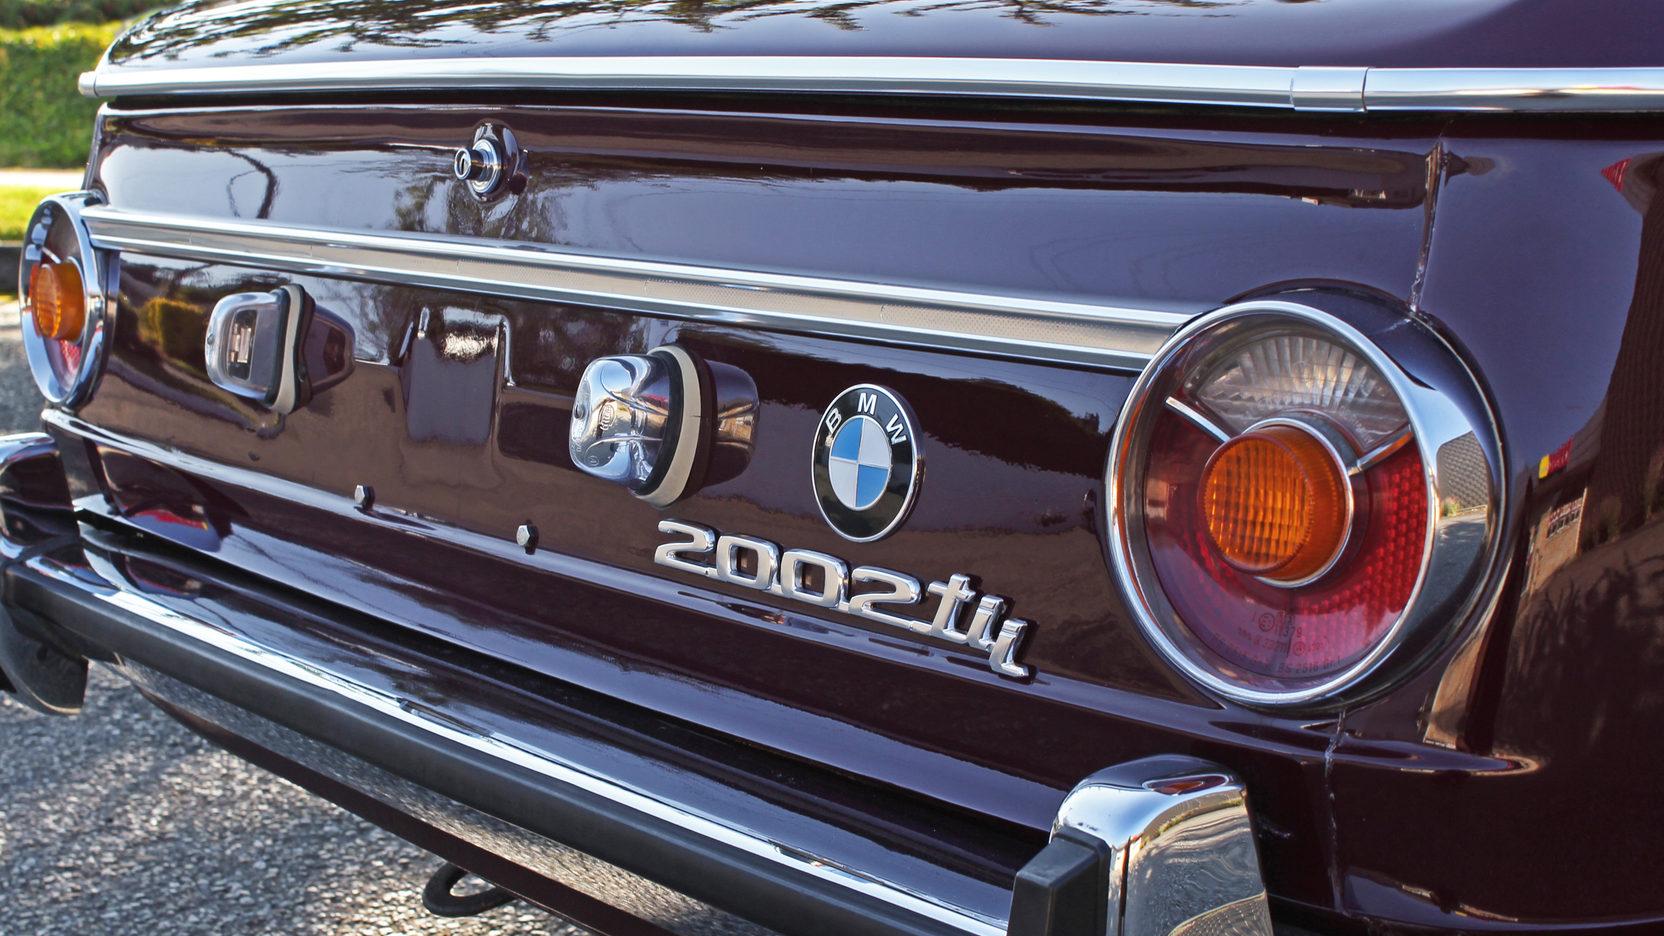 BMW 2002 right hand rear corner with emblem